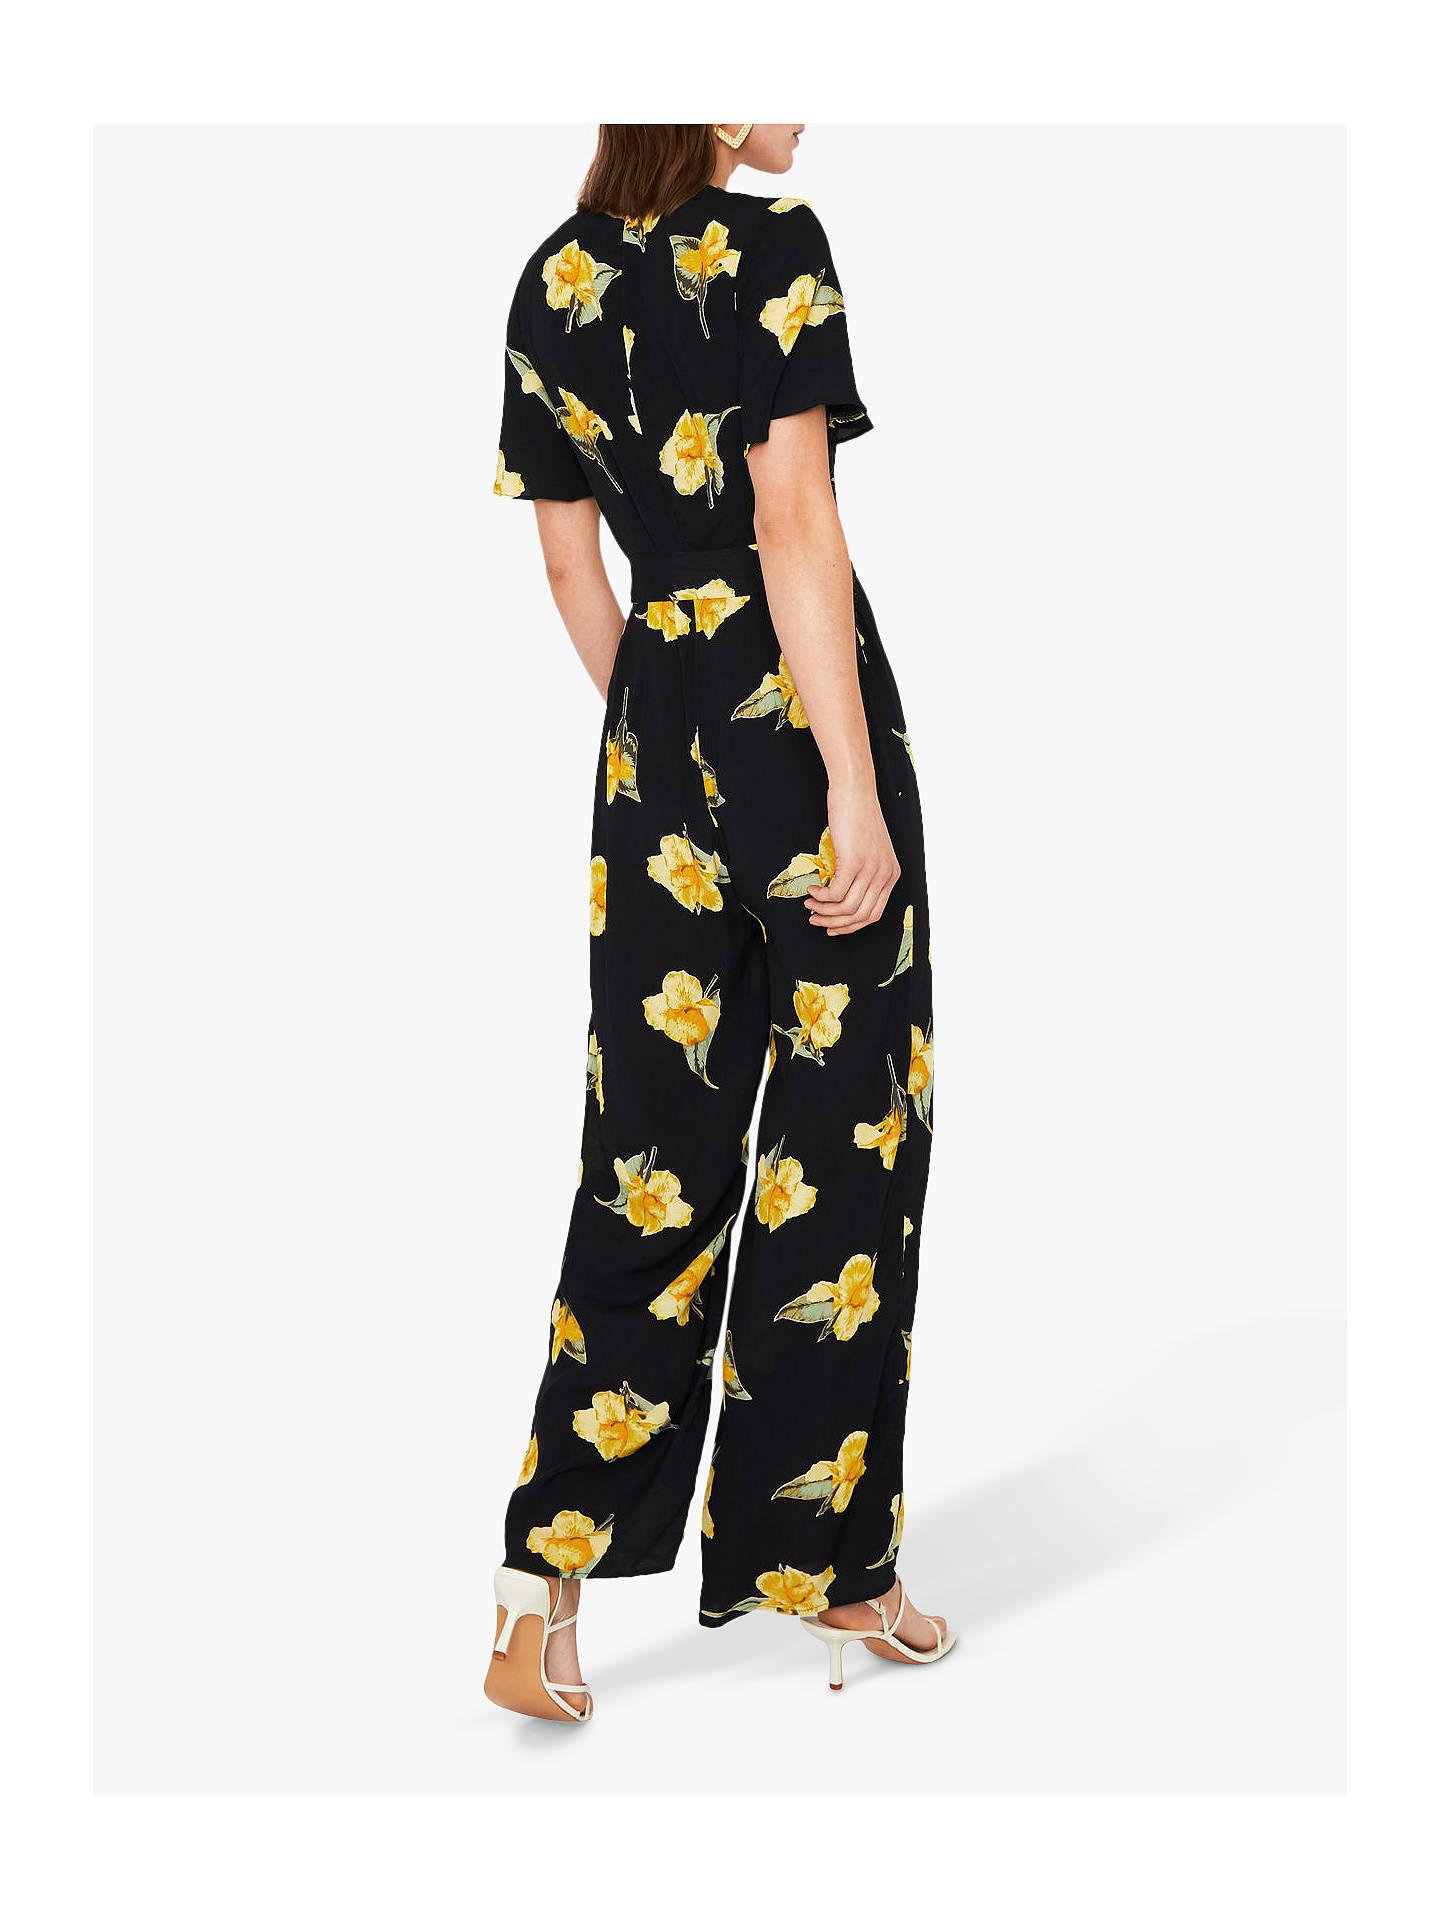 Warehouse Katy Floral Jumpsuit, Black at John Lewis & Partners